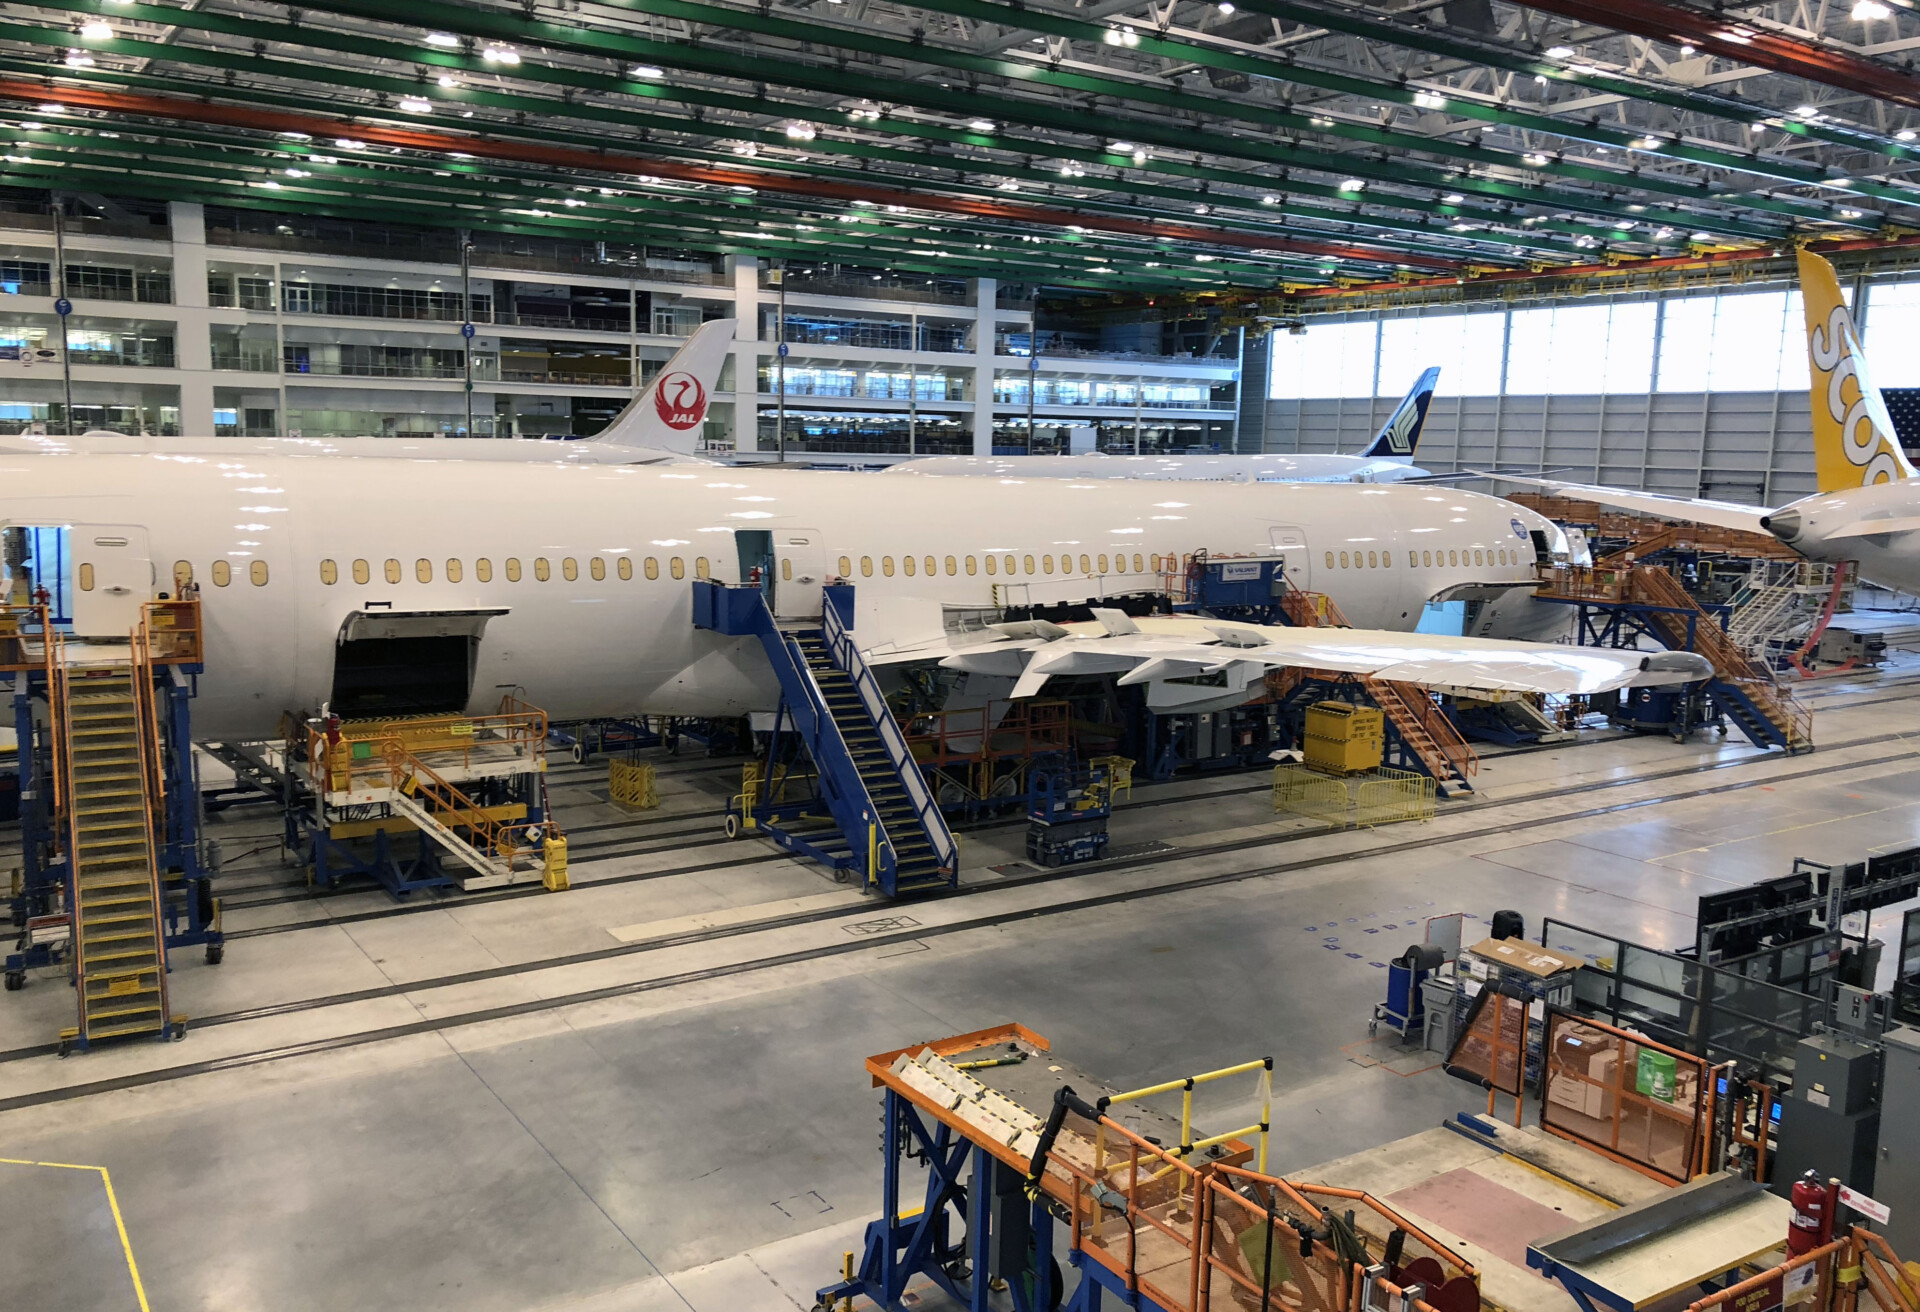 How Is A Composite Comercial Jet Aircraft Built?